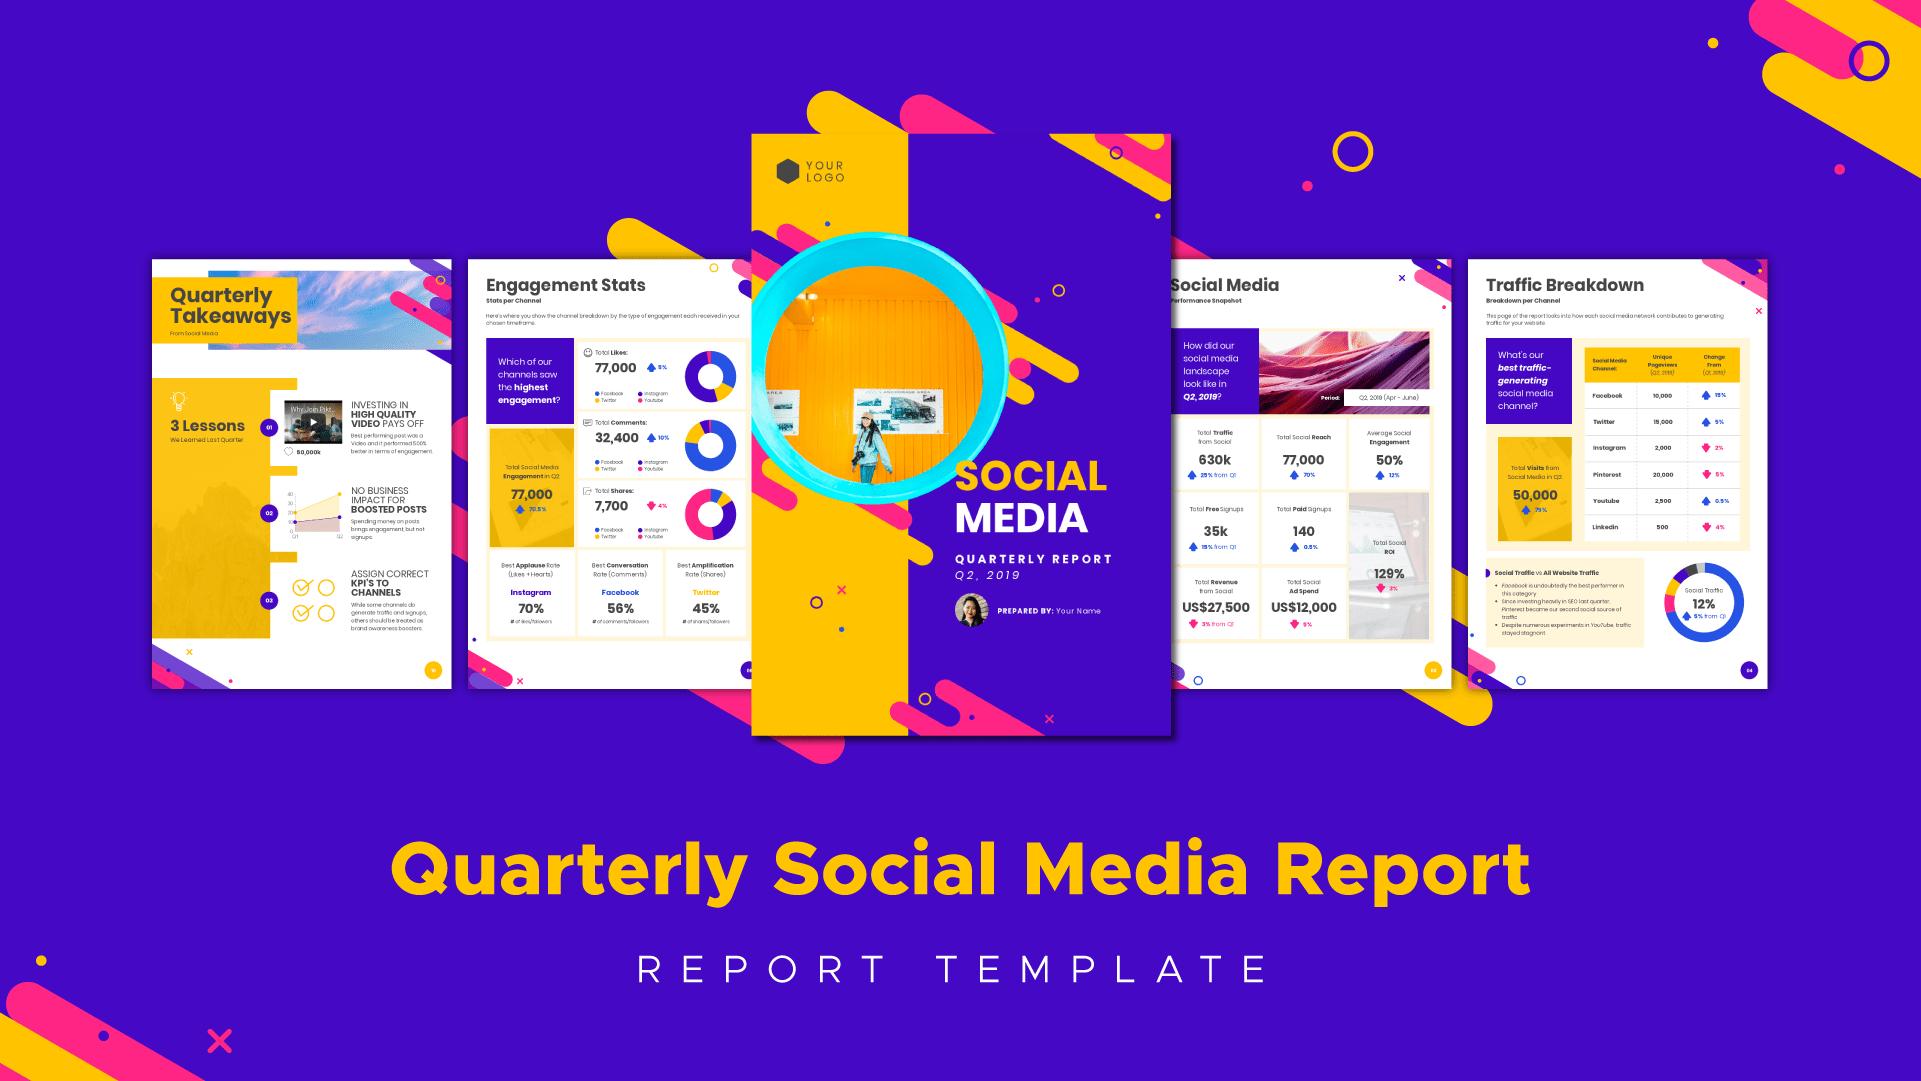 Social Media Marketing How To Create Impactful Reports  Piktochart Pertaining To Social Media Marketing Report Template